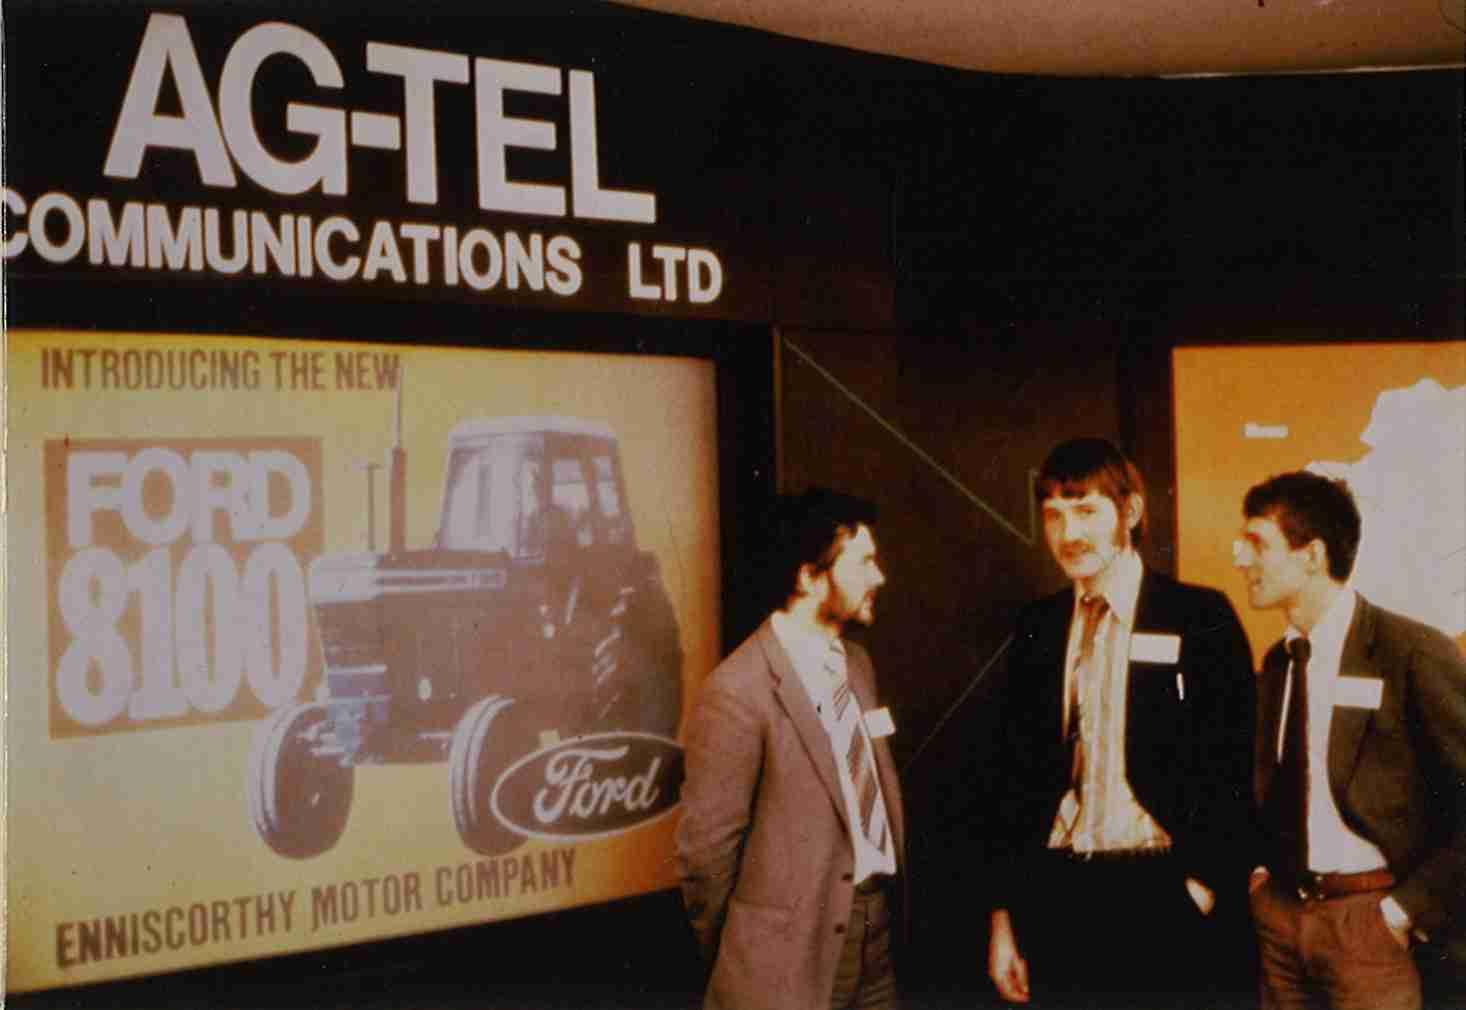 John Cummins & Declan Farrell in the early days of Agtel